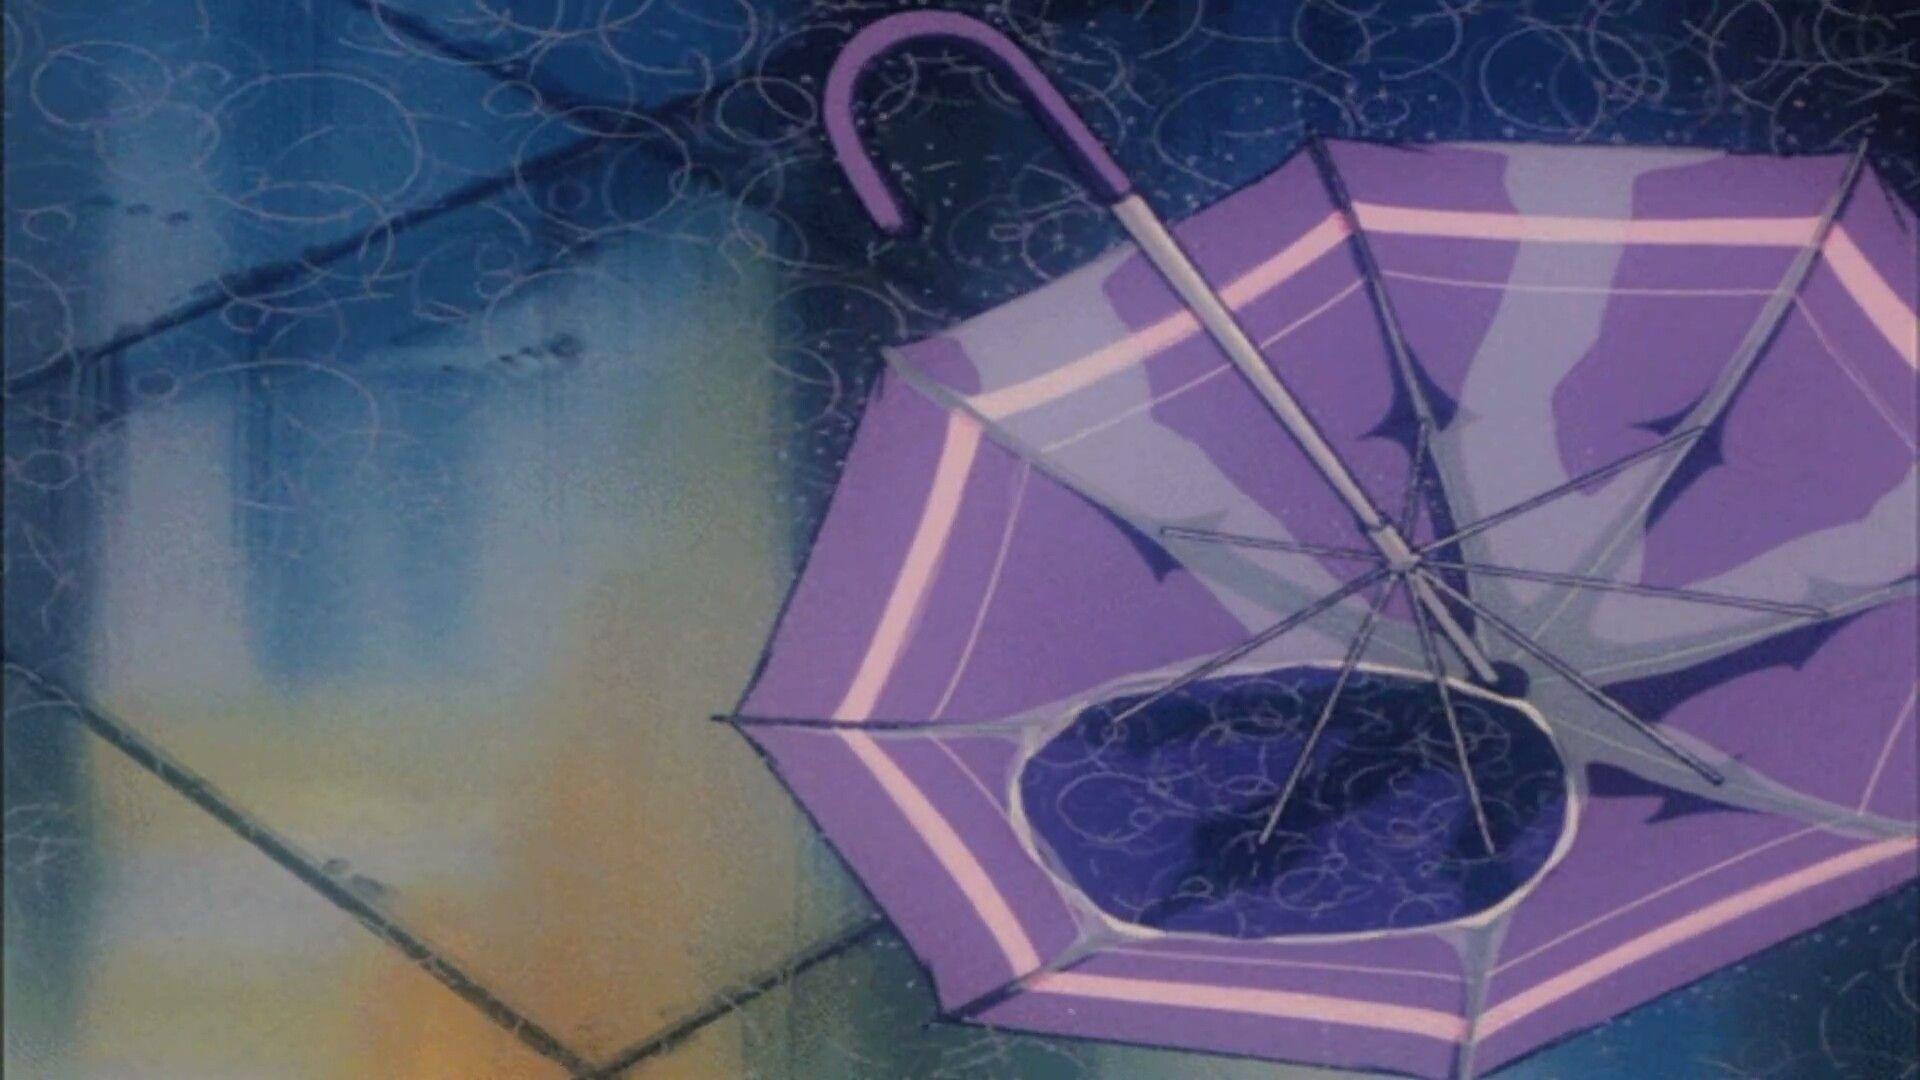 90s Anime Aesthetic Desktop Wallpapers Wallpaper Cave